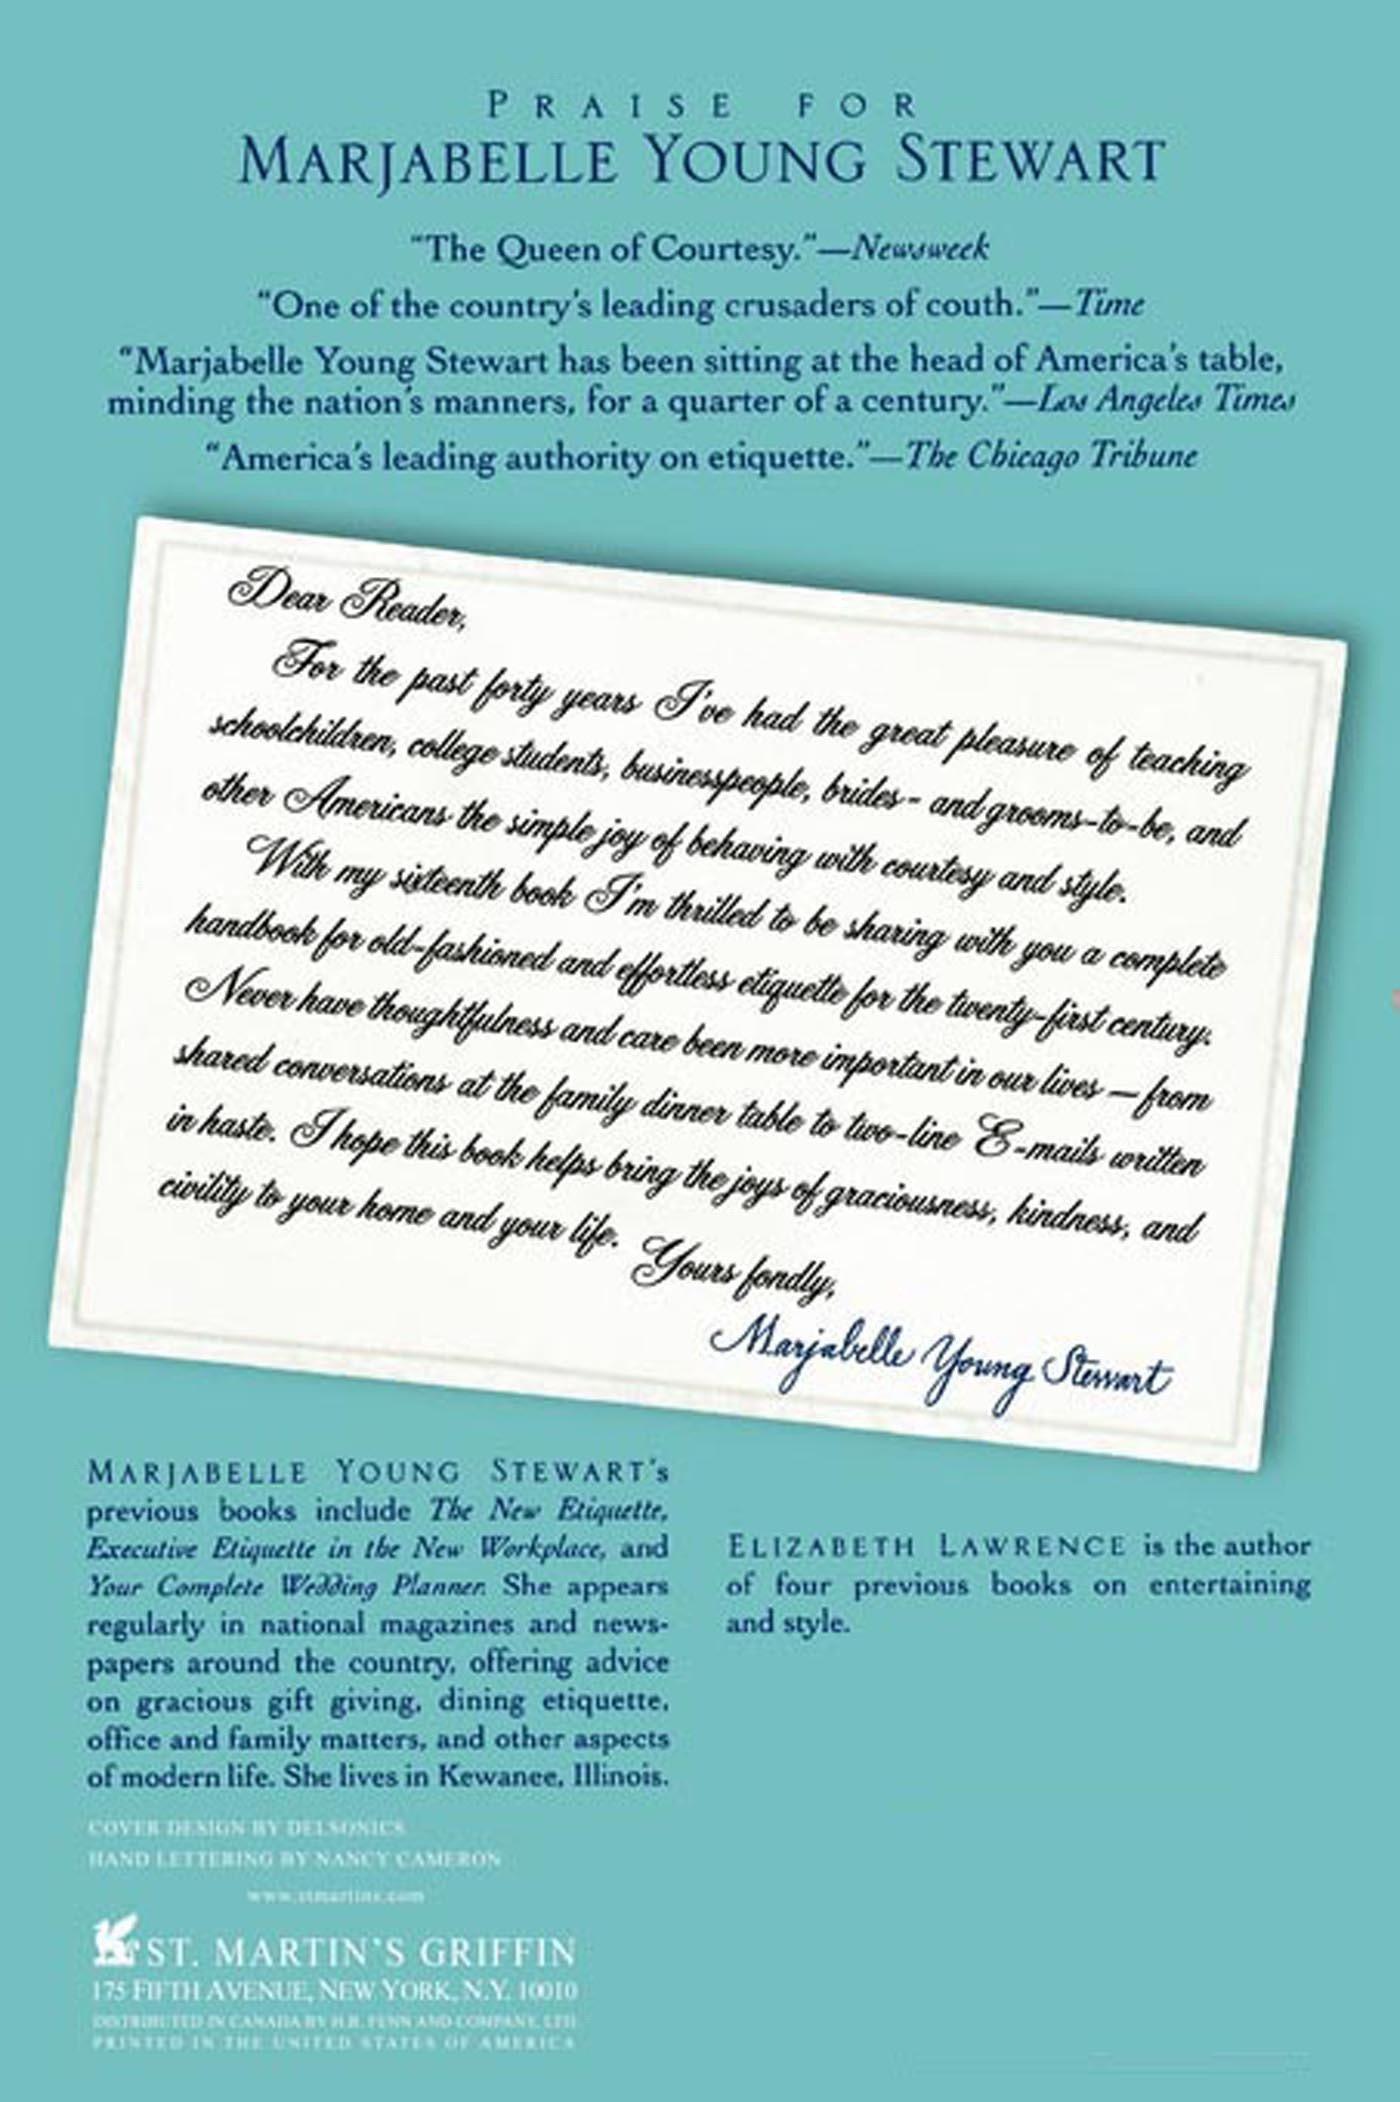 amazon com commonsense etiquette a guide to gracious simple amazon com commonsense etiquette a guide to gracious simple manners for the twenty first century 9780312242947 elizabeth lawrence books